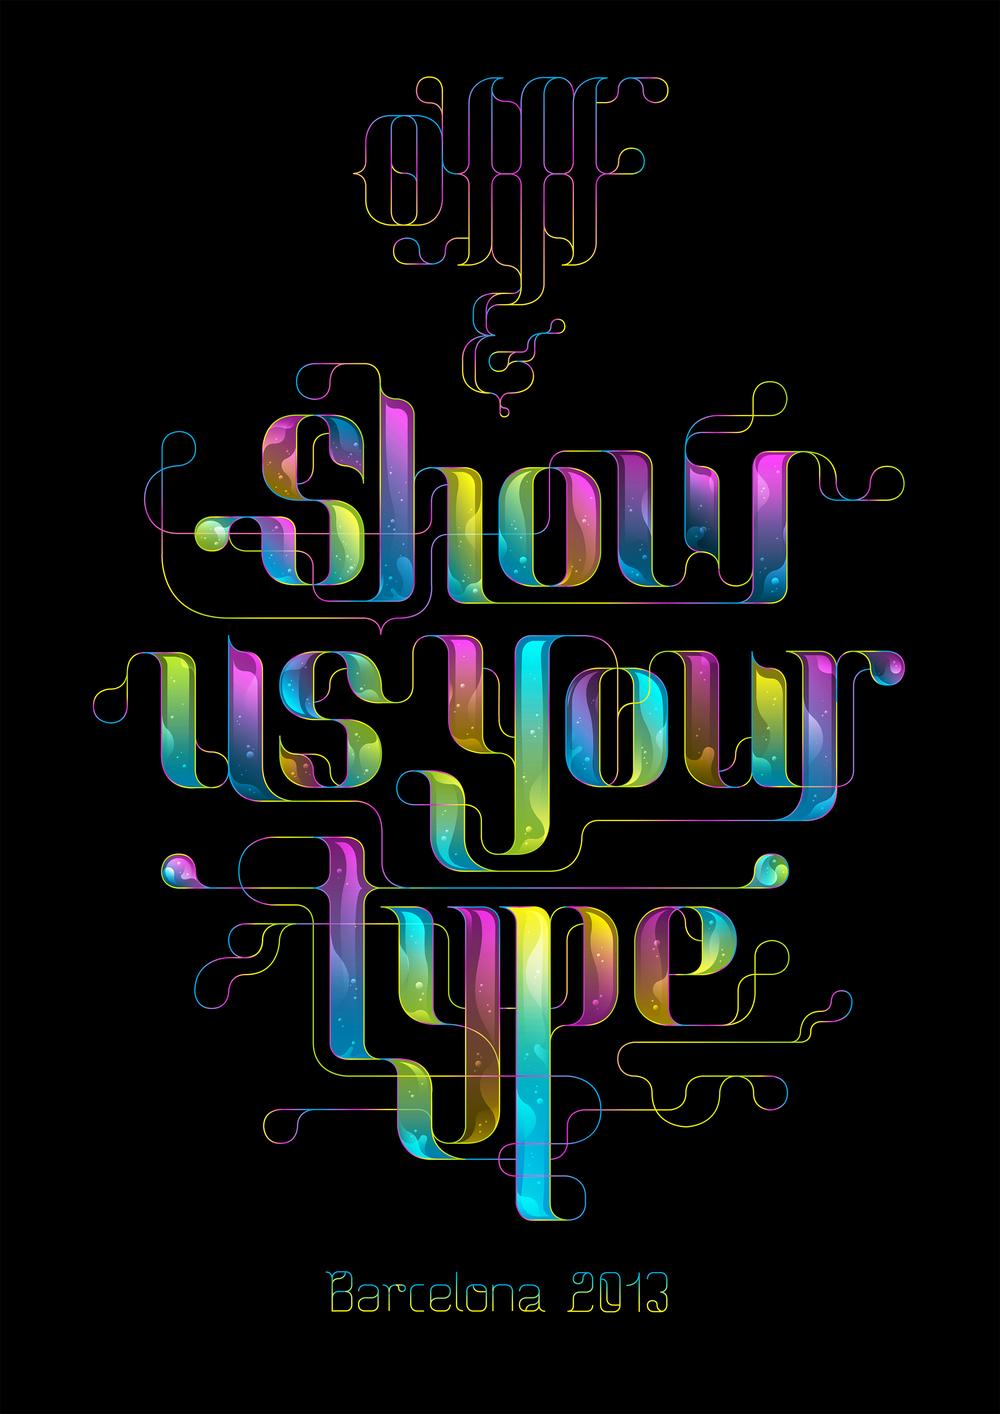 OFFF & SHOWUSYOURTYPE Artwork exposed Lettering / Illustration.